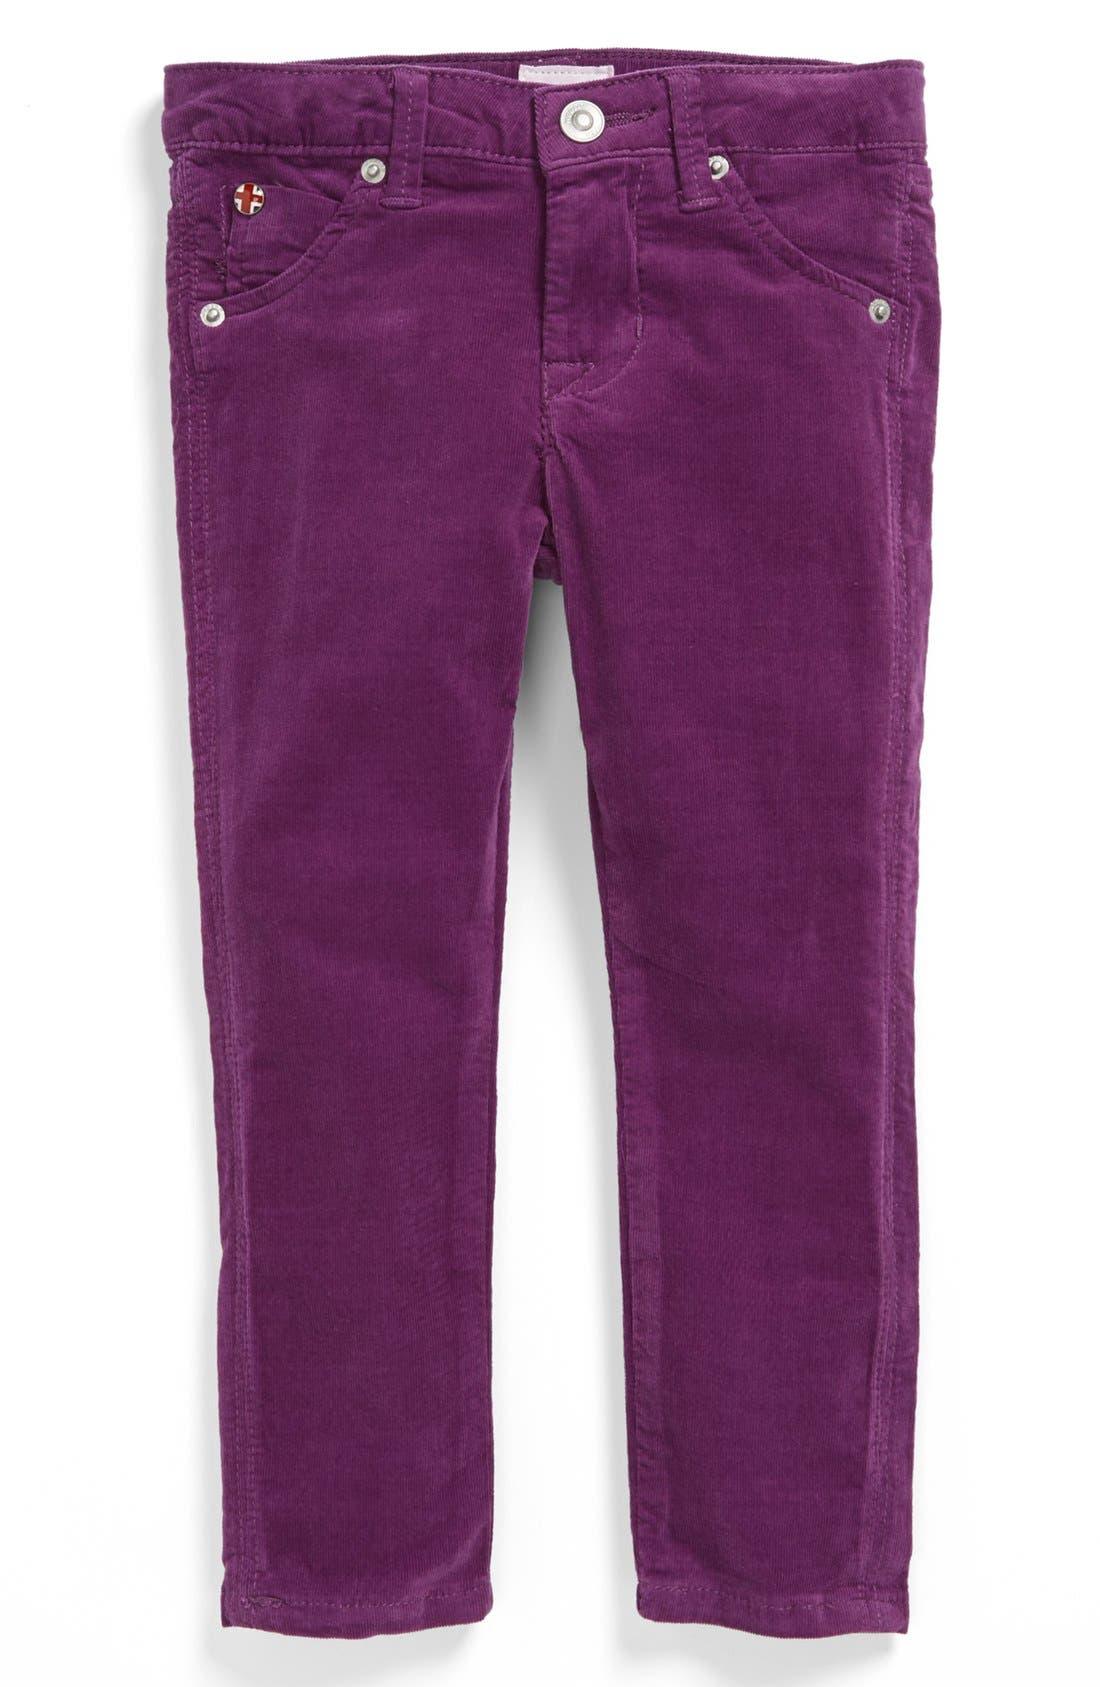 Alternate Image 2  - Hudson Kids Corduroy Skinny Jeans (Toddler Girls)